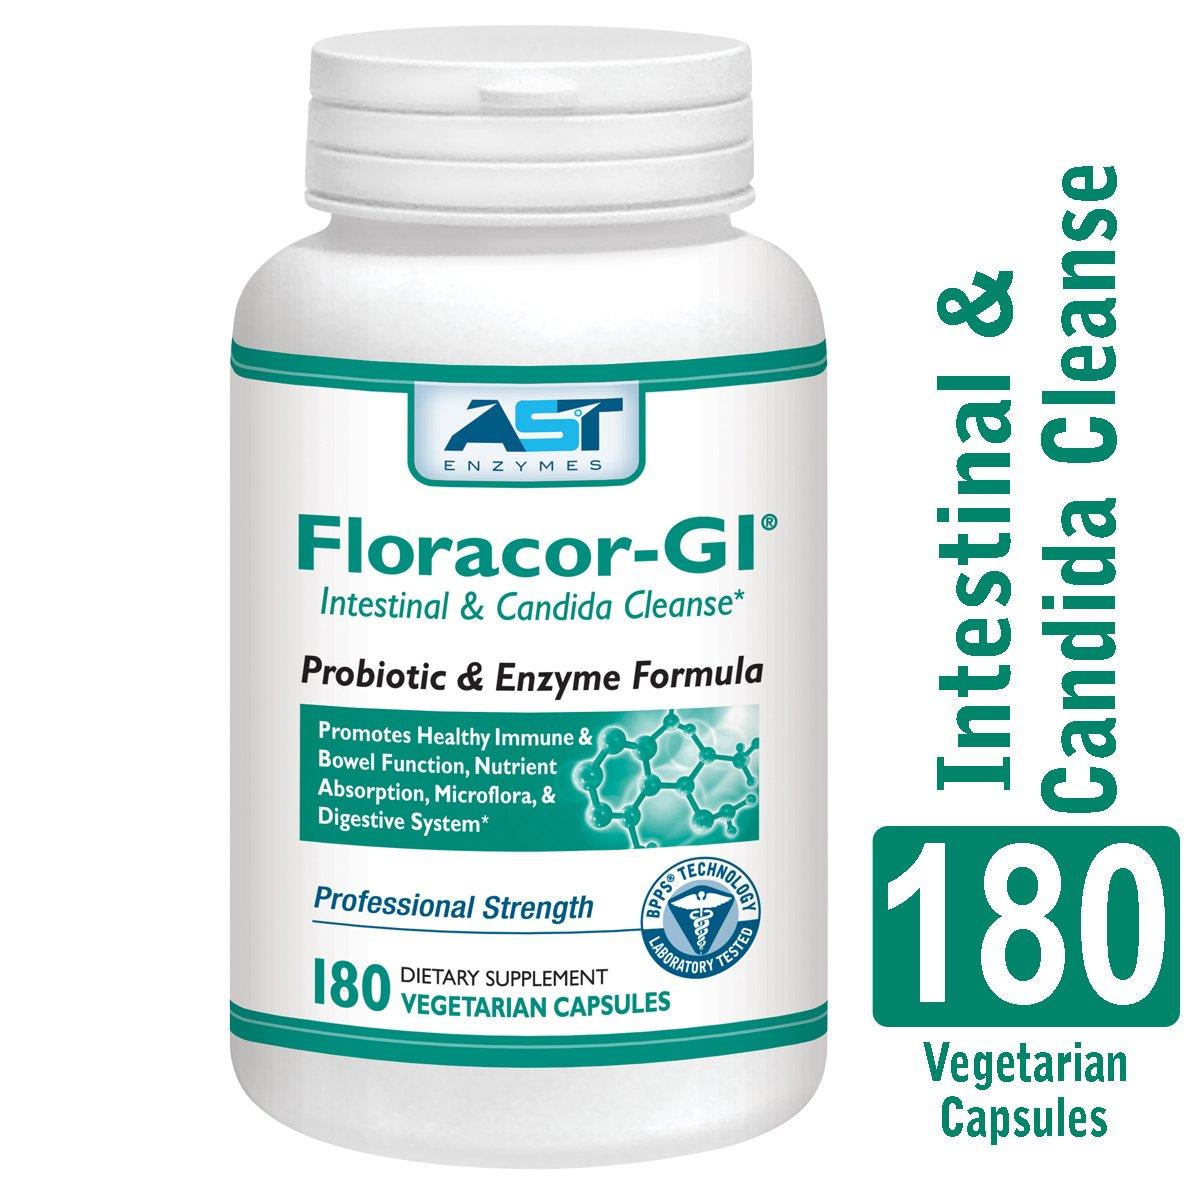 Amazon.com: Floracor-GI Candida - Limpiador de levadura ...